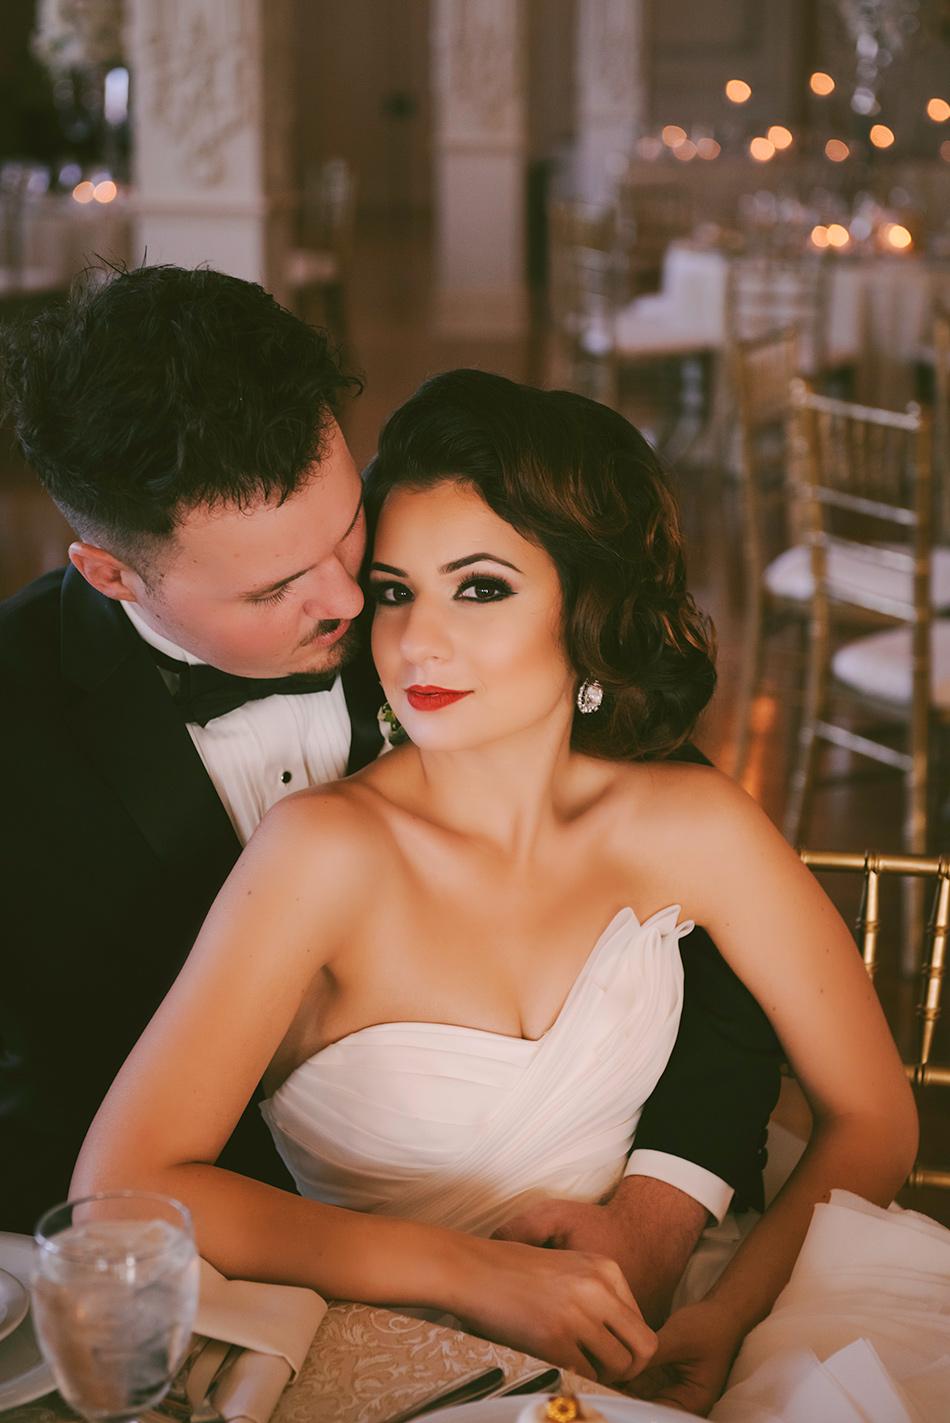 AD Passion Photography | stephany-and-nathan-wedding-dallas_194 | Adelin, Dida, fotograf profesionist, fotograf de nunta, fotografie de nunta, fotograf Timisoara, fotograf Craiova, fotograf Bucuresti, fotograf Arad, nunta Timisoara, nunta Arad, nunta Bucuresti, nunta Craiova